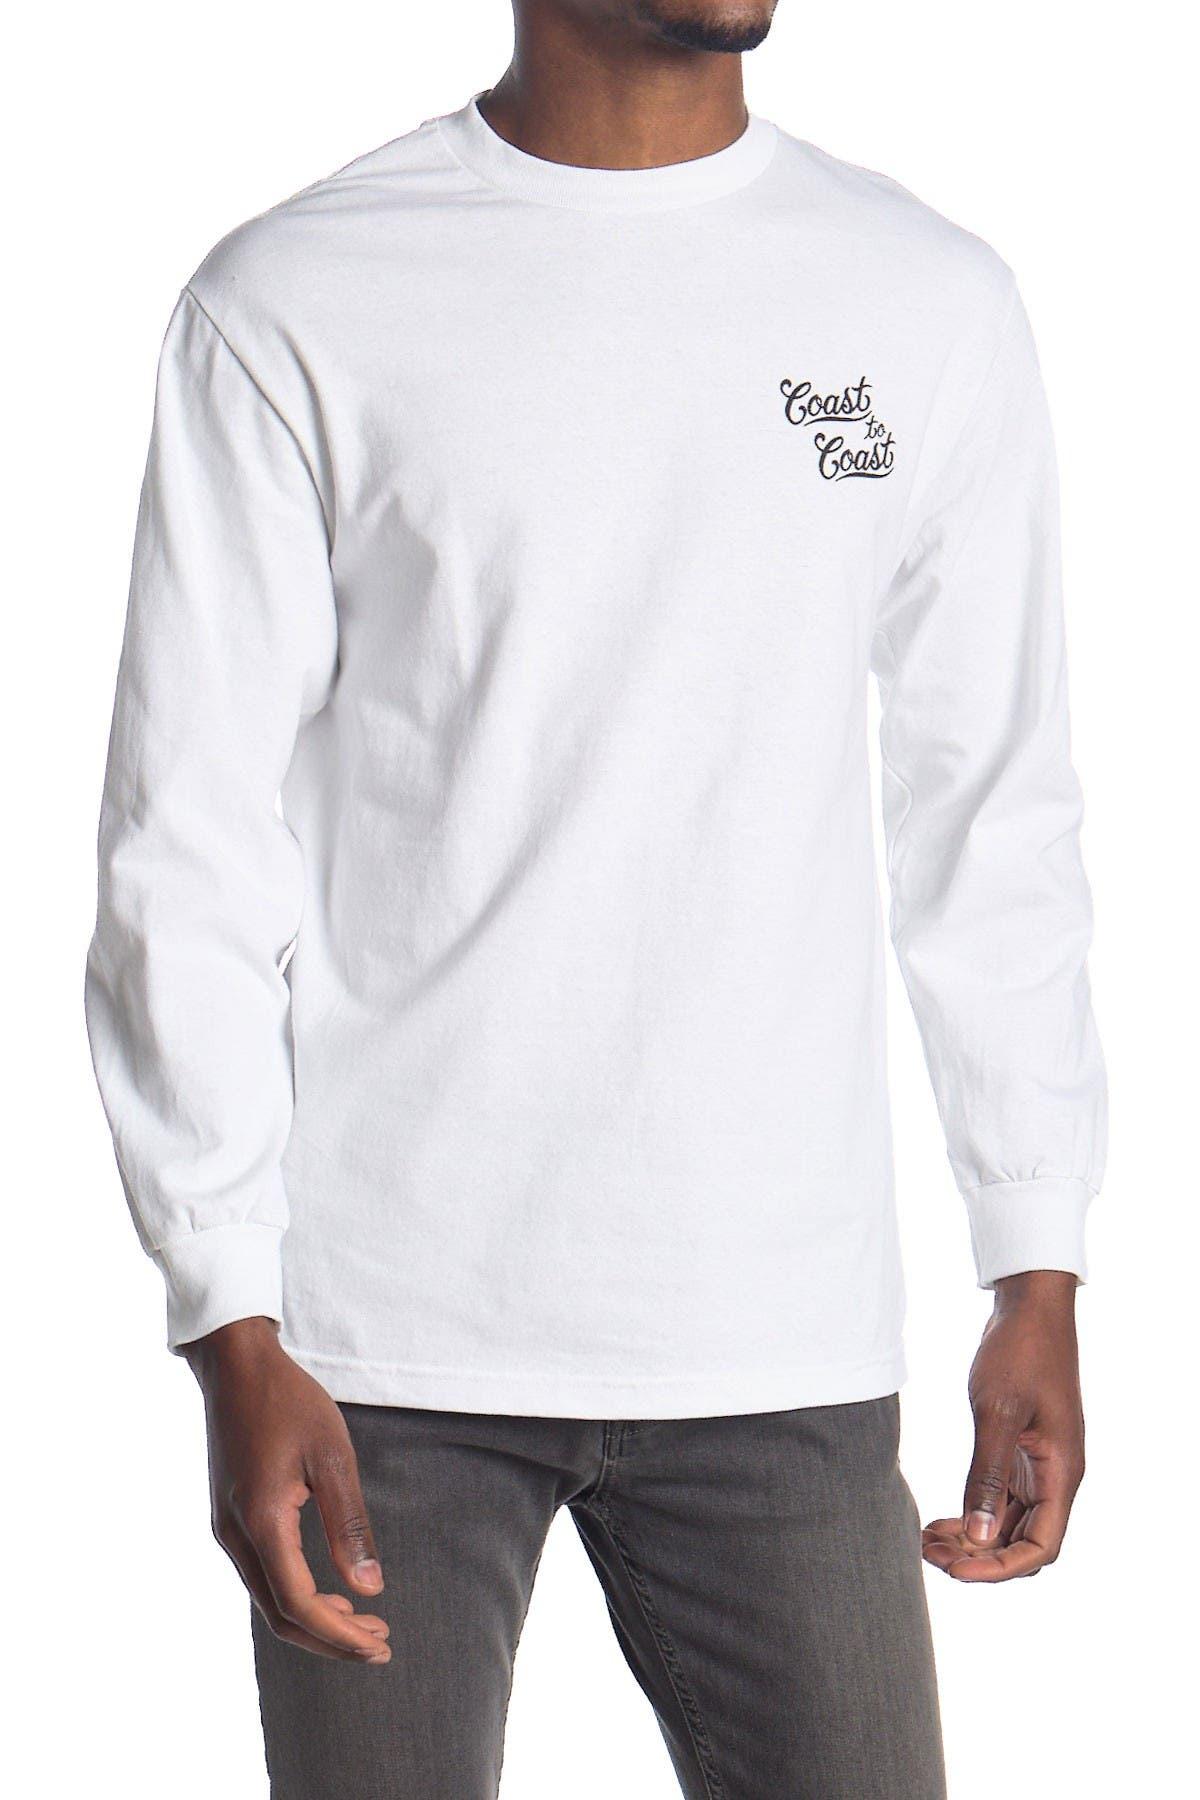 Image of DARK SEAS Graphic Long Sleeve Shirt